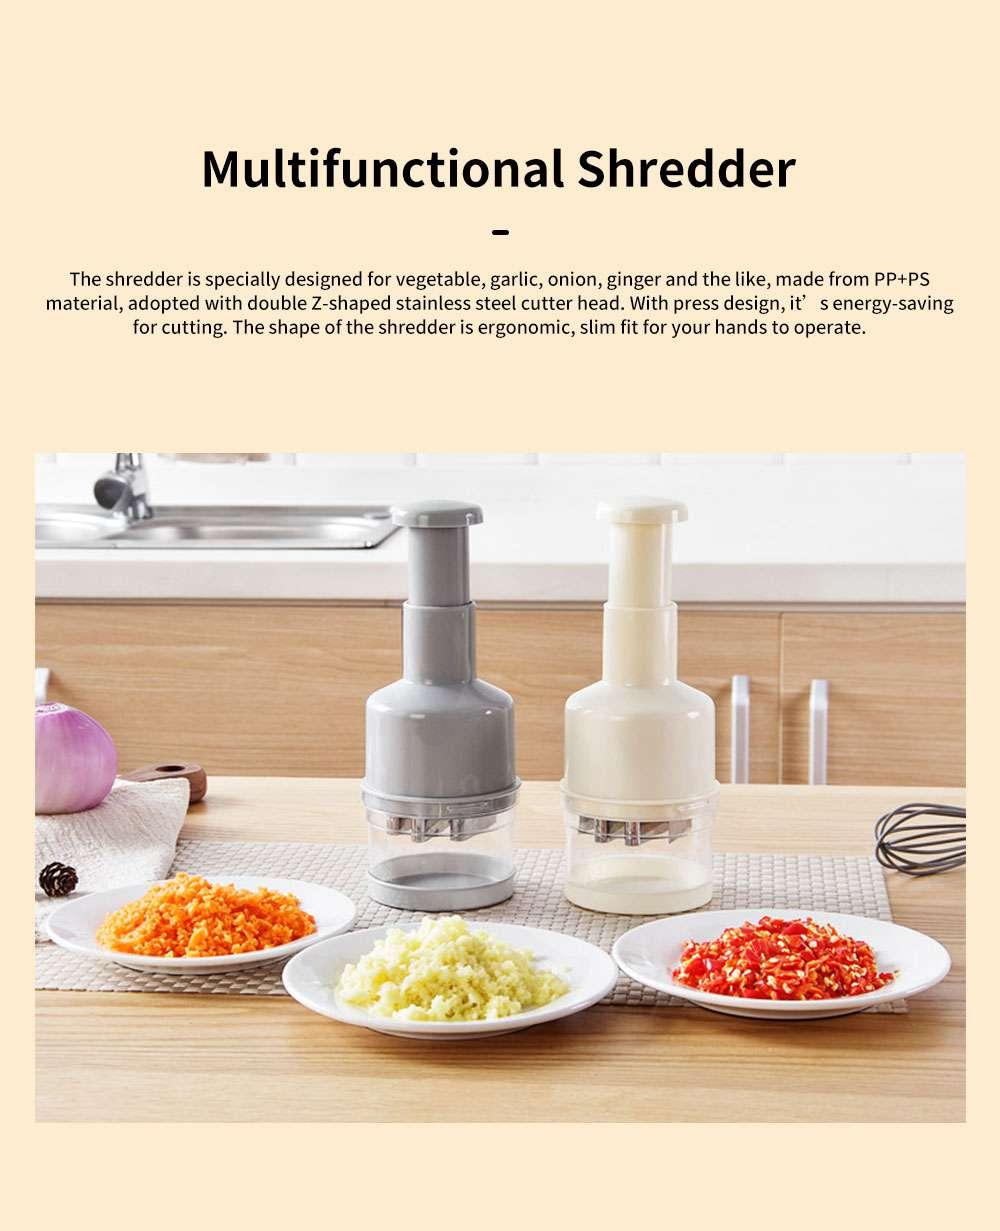 Multifunctional Shredder for Garlic Onion Ginger Home Use Garlic Press Vegetable Cracker Meat Chopper Cutter, Kitchen Multifunction Cutter 0